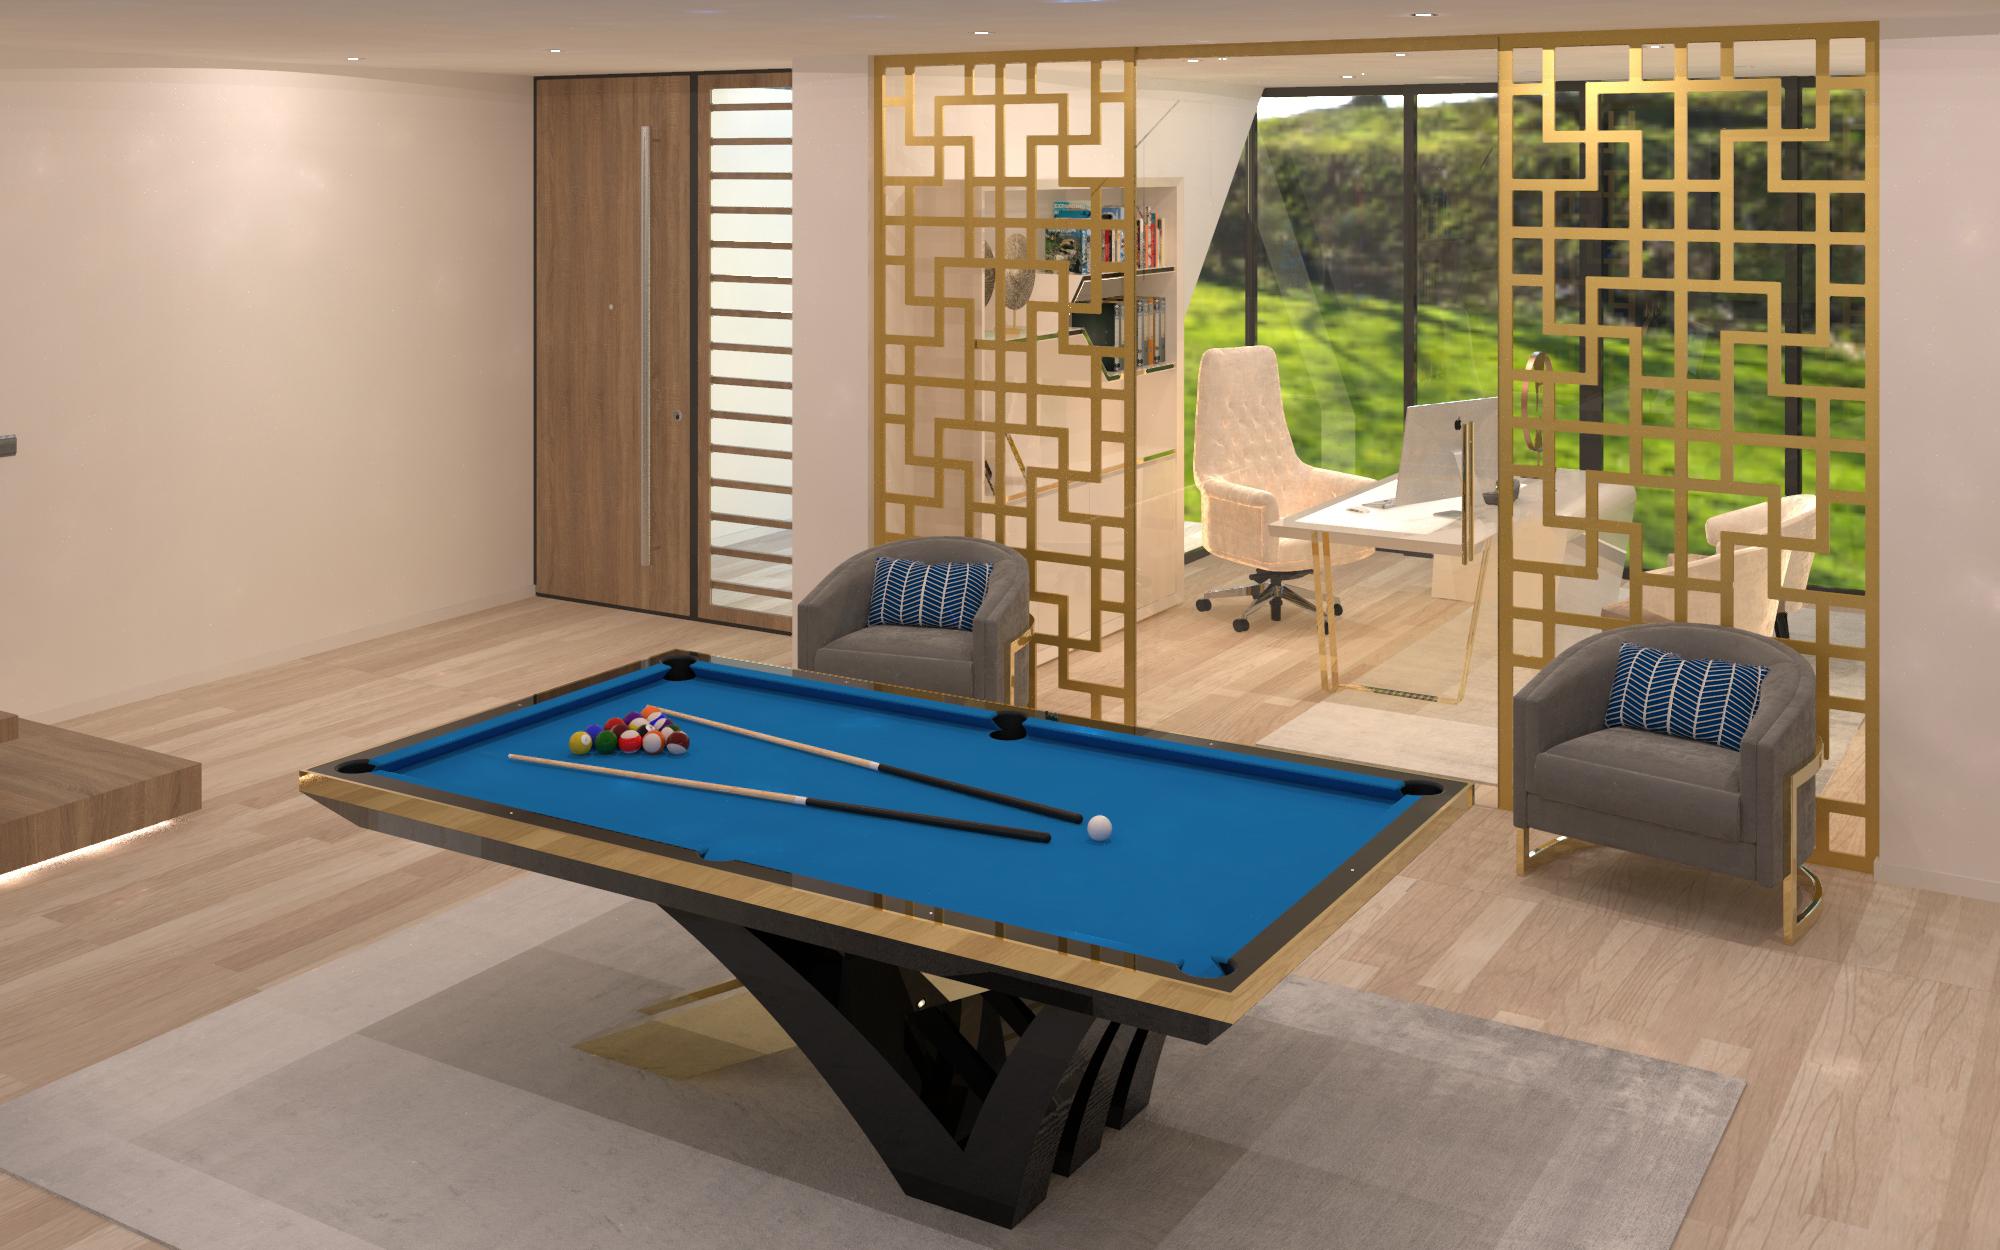 Snooker_01-3.jpg